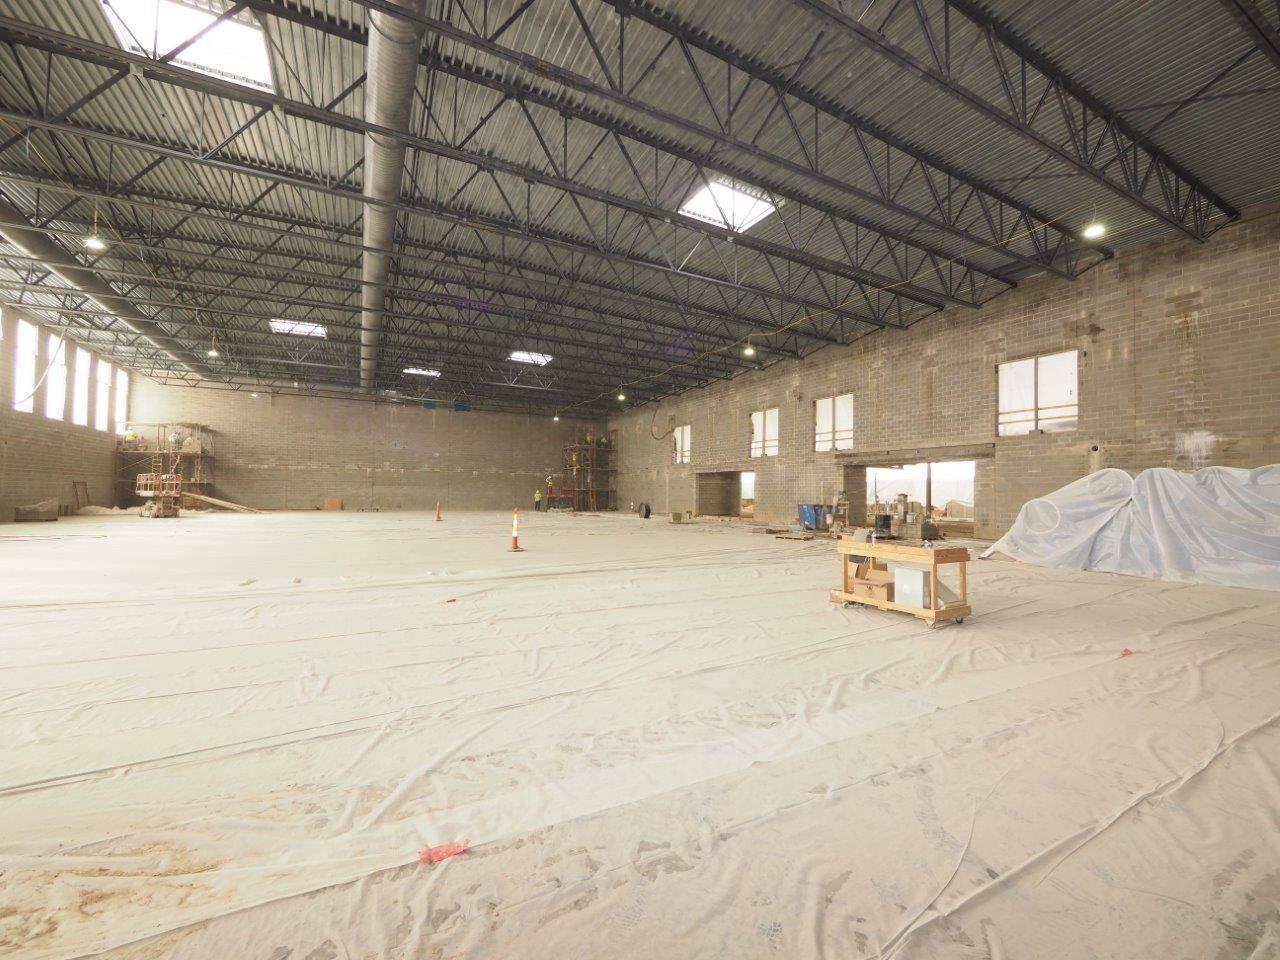 Inside the new high school gymnasium